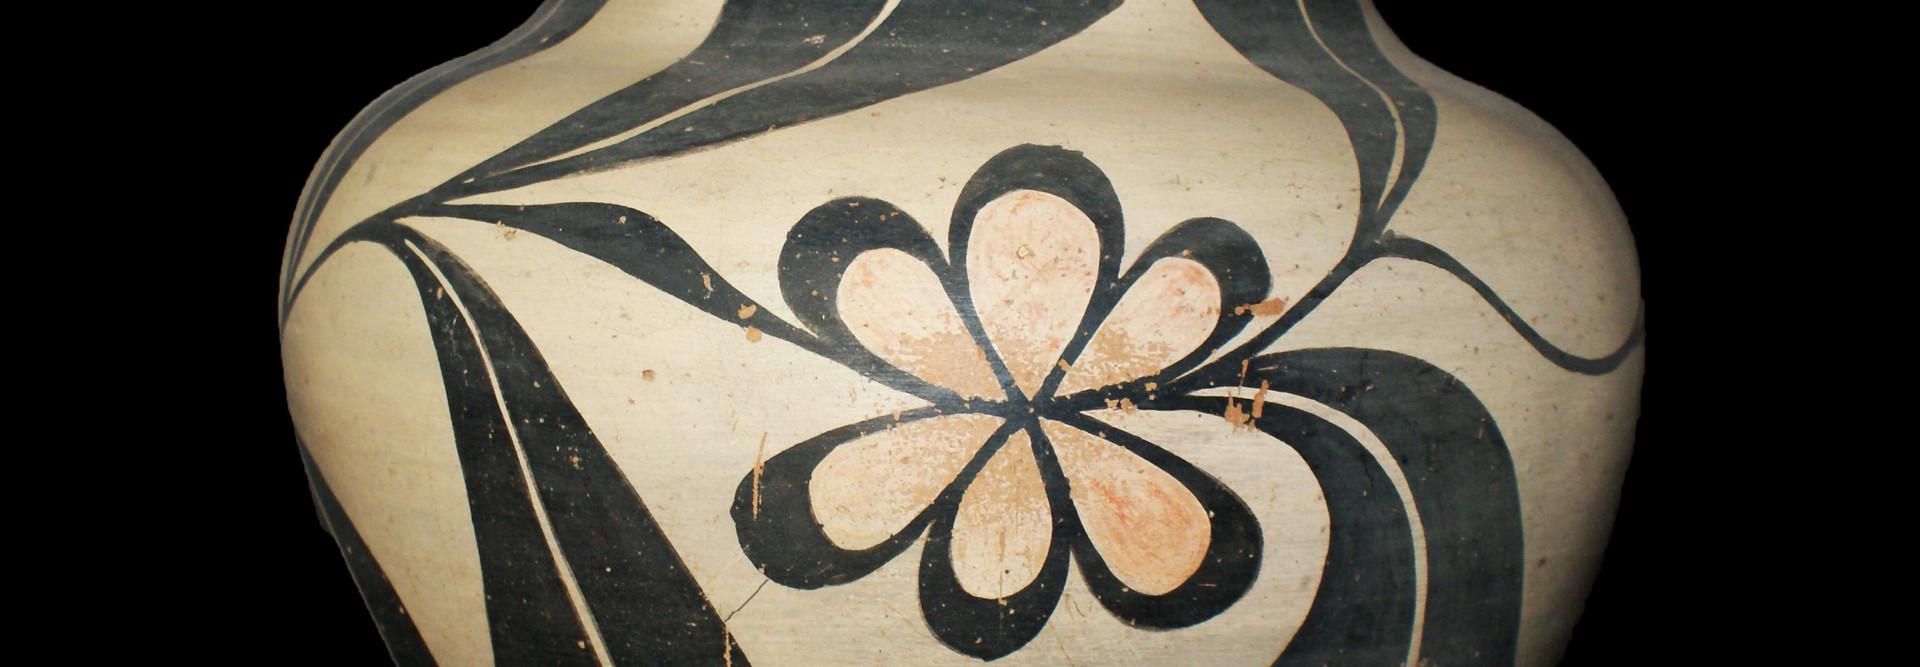 Santo Domingo Pueblo Polychrome Decorated Large Jar Artist Unknown